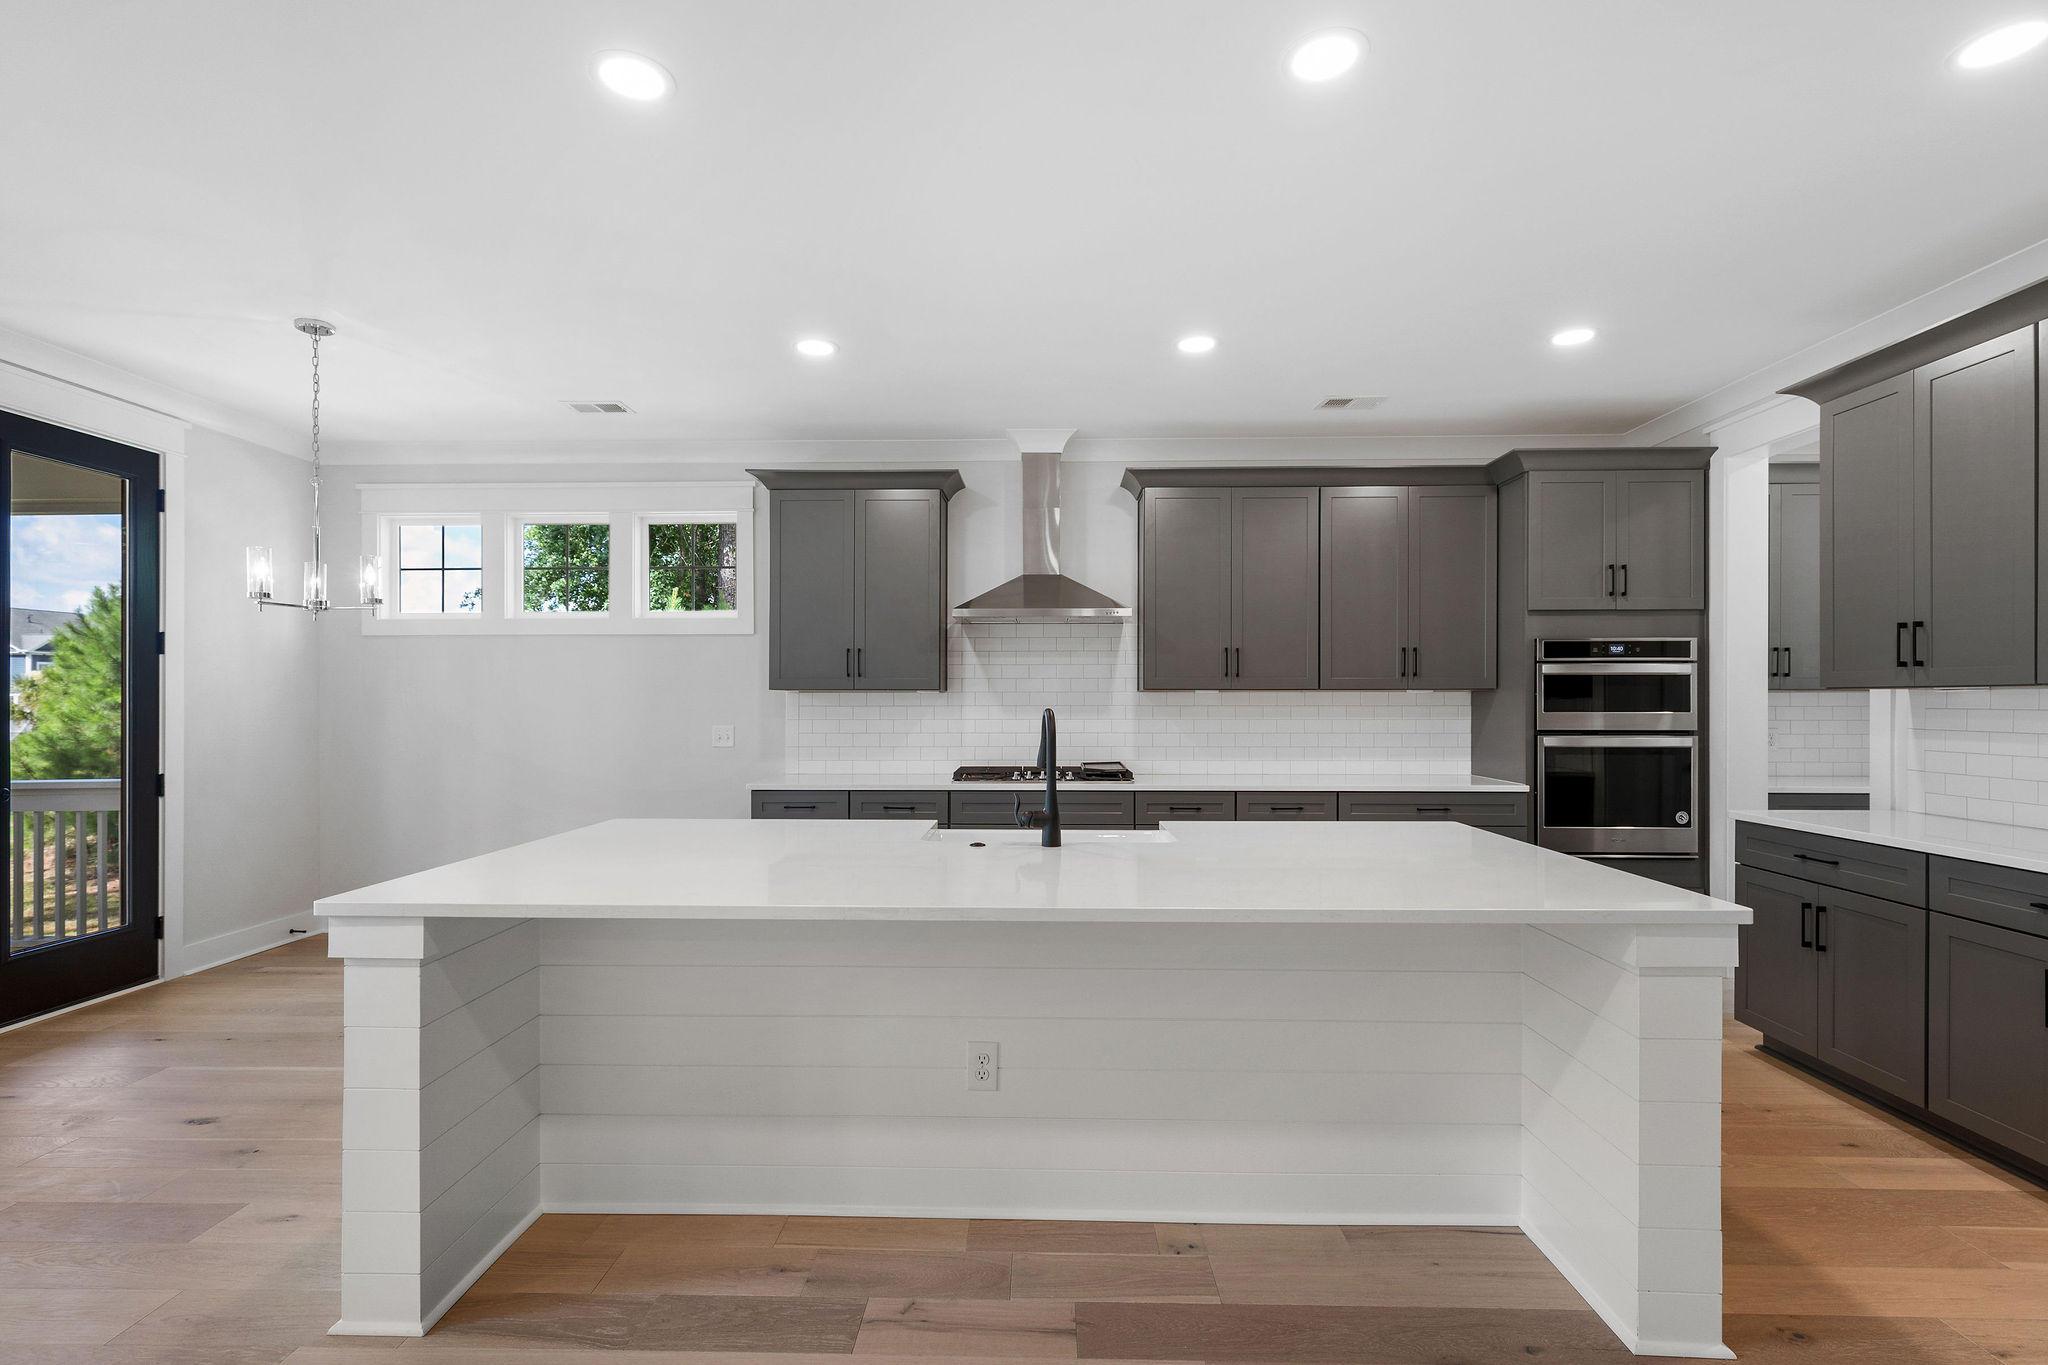 Park West Homes For Sale - 2291 Middlesex, Mount Pleasant, SC - 55